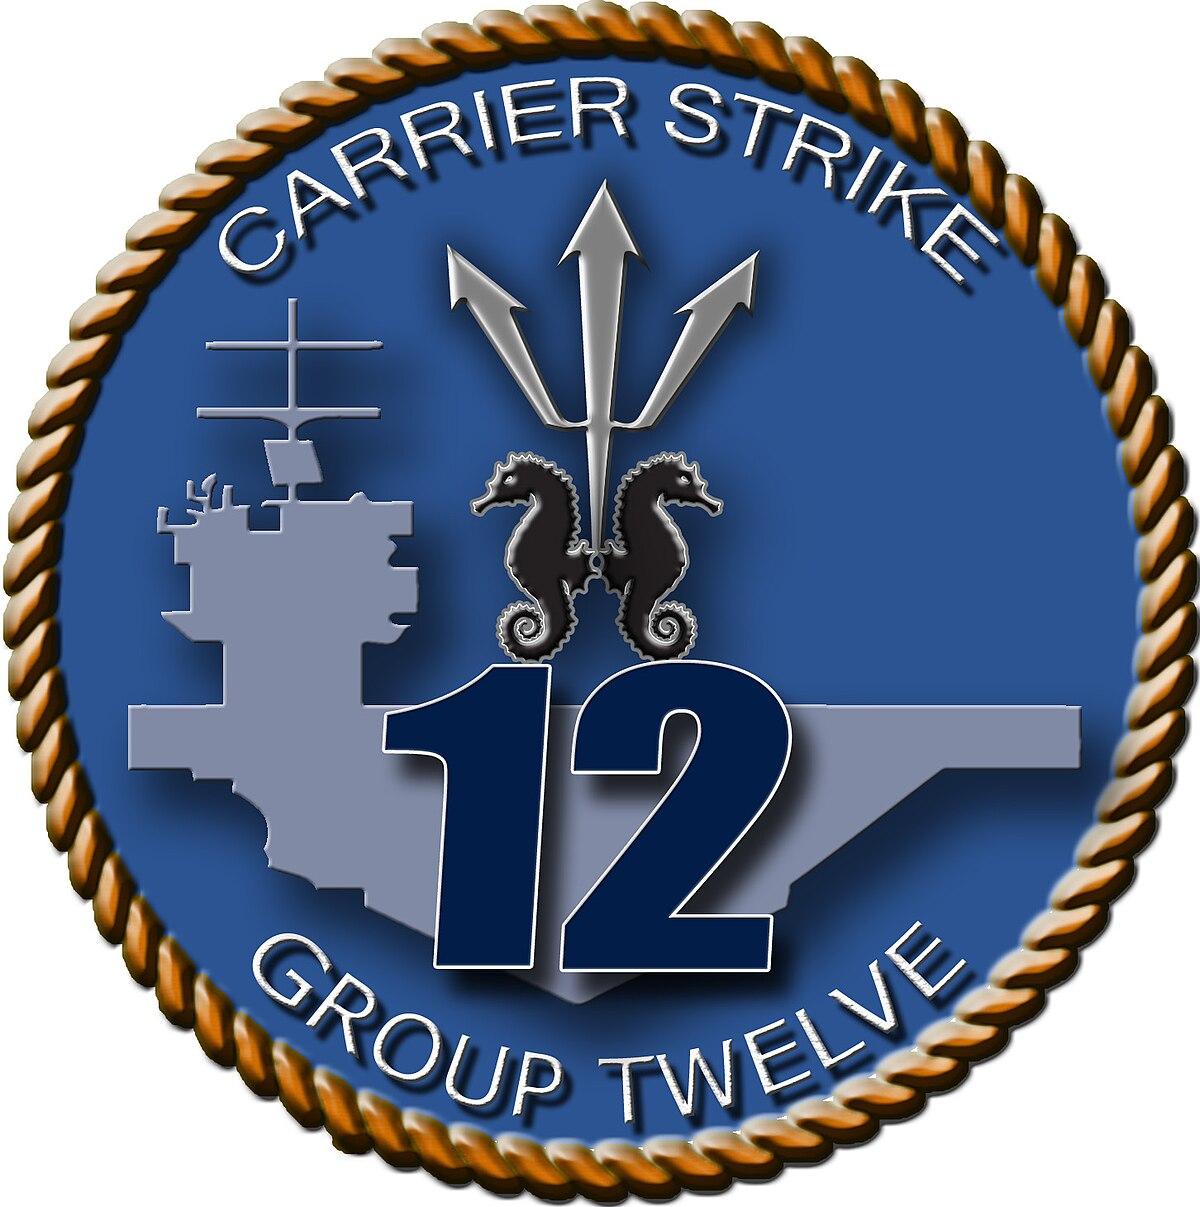 Carrier Strike Group 12 - Wikipedia